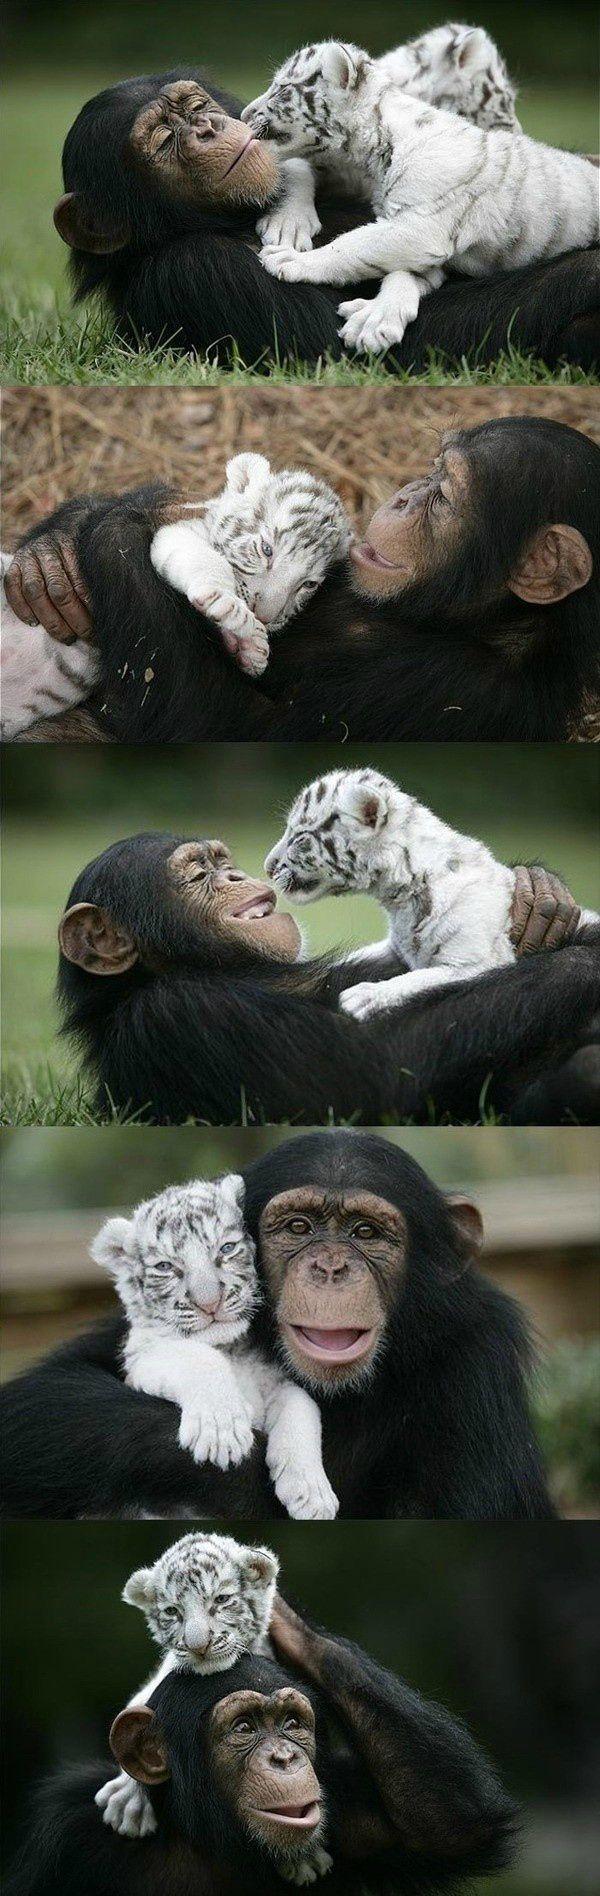 Unexpected Friends